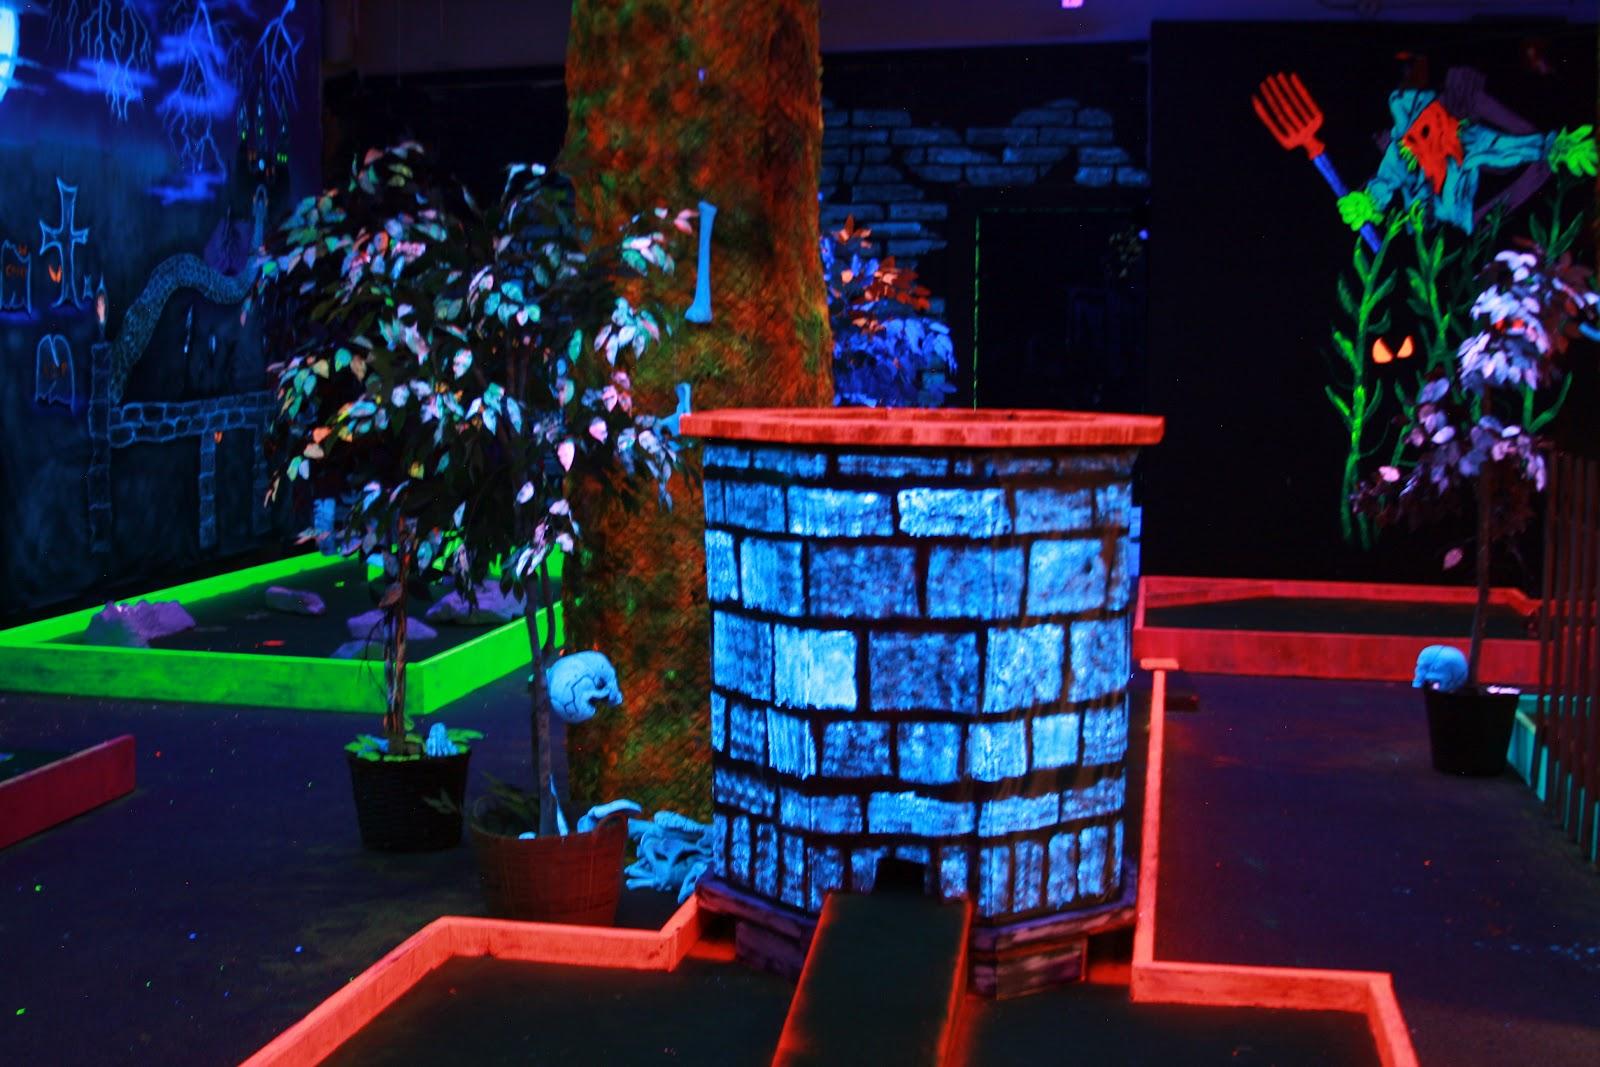 garage halloween party ideas - Enjoy Utah Haunted Mini Golf and Halloween Party